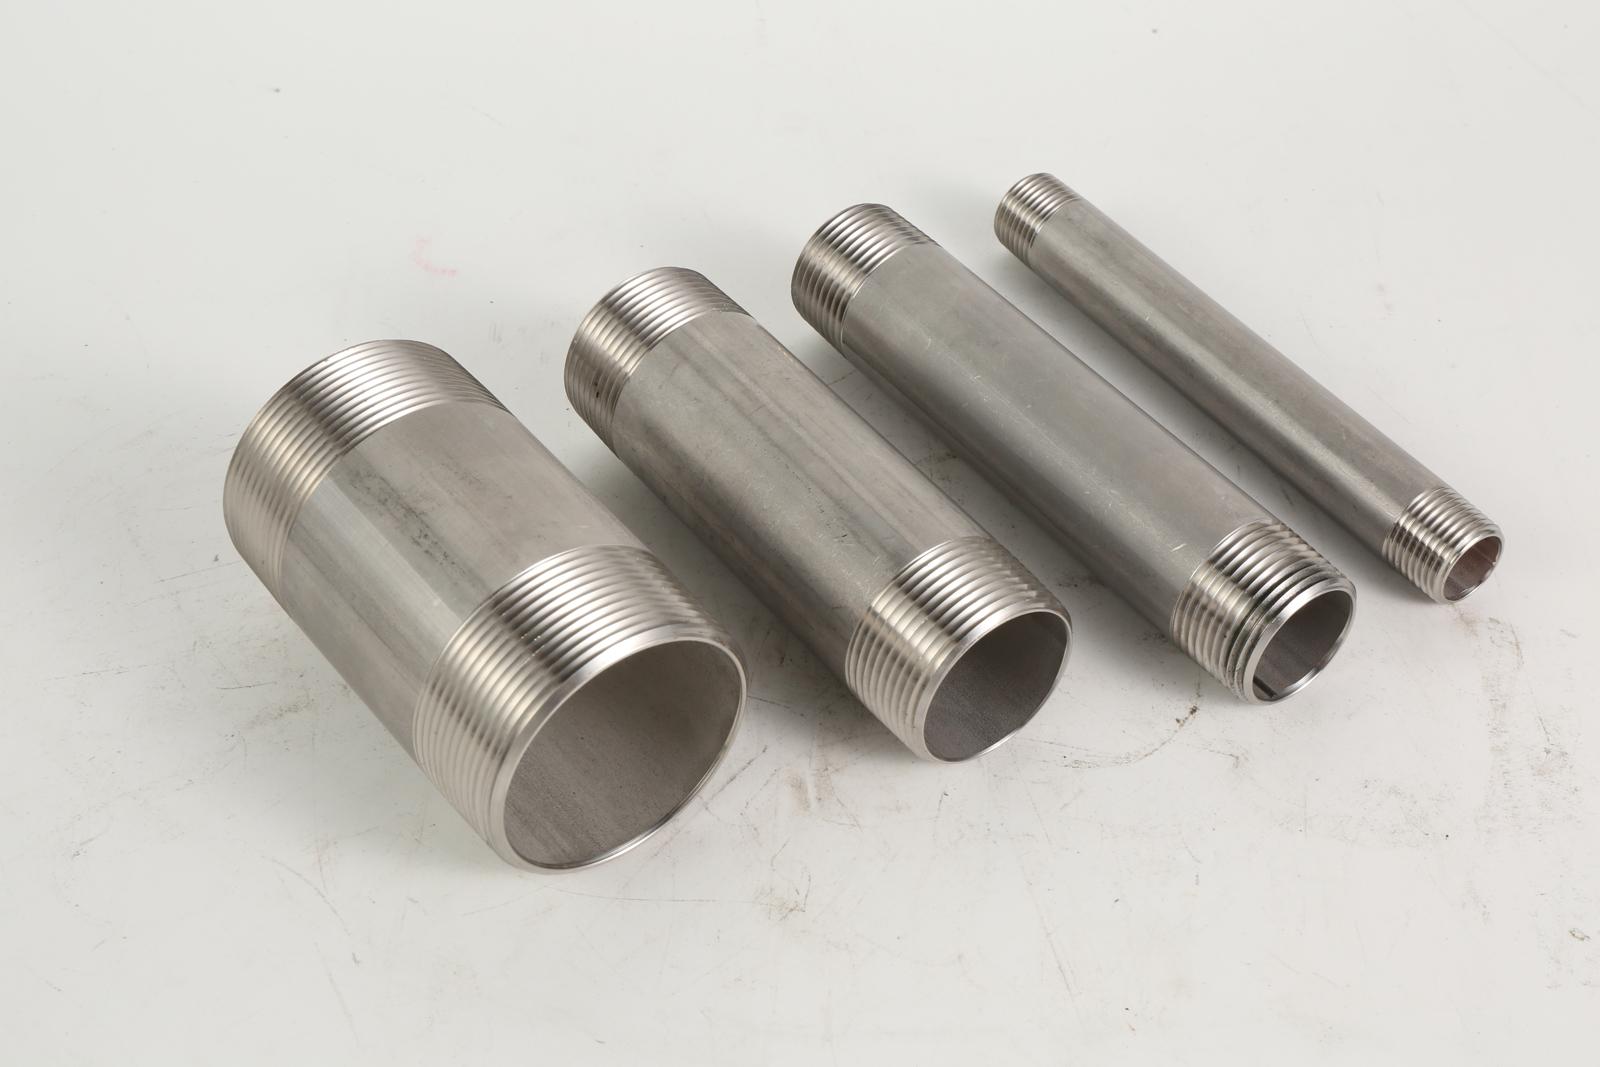 Plainthreadedswage pipe nipples manufacturer